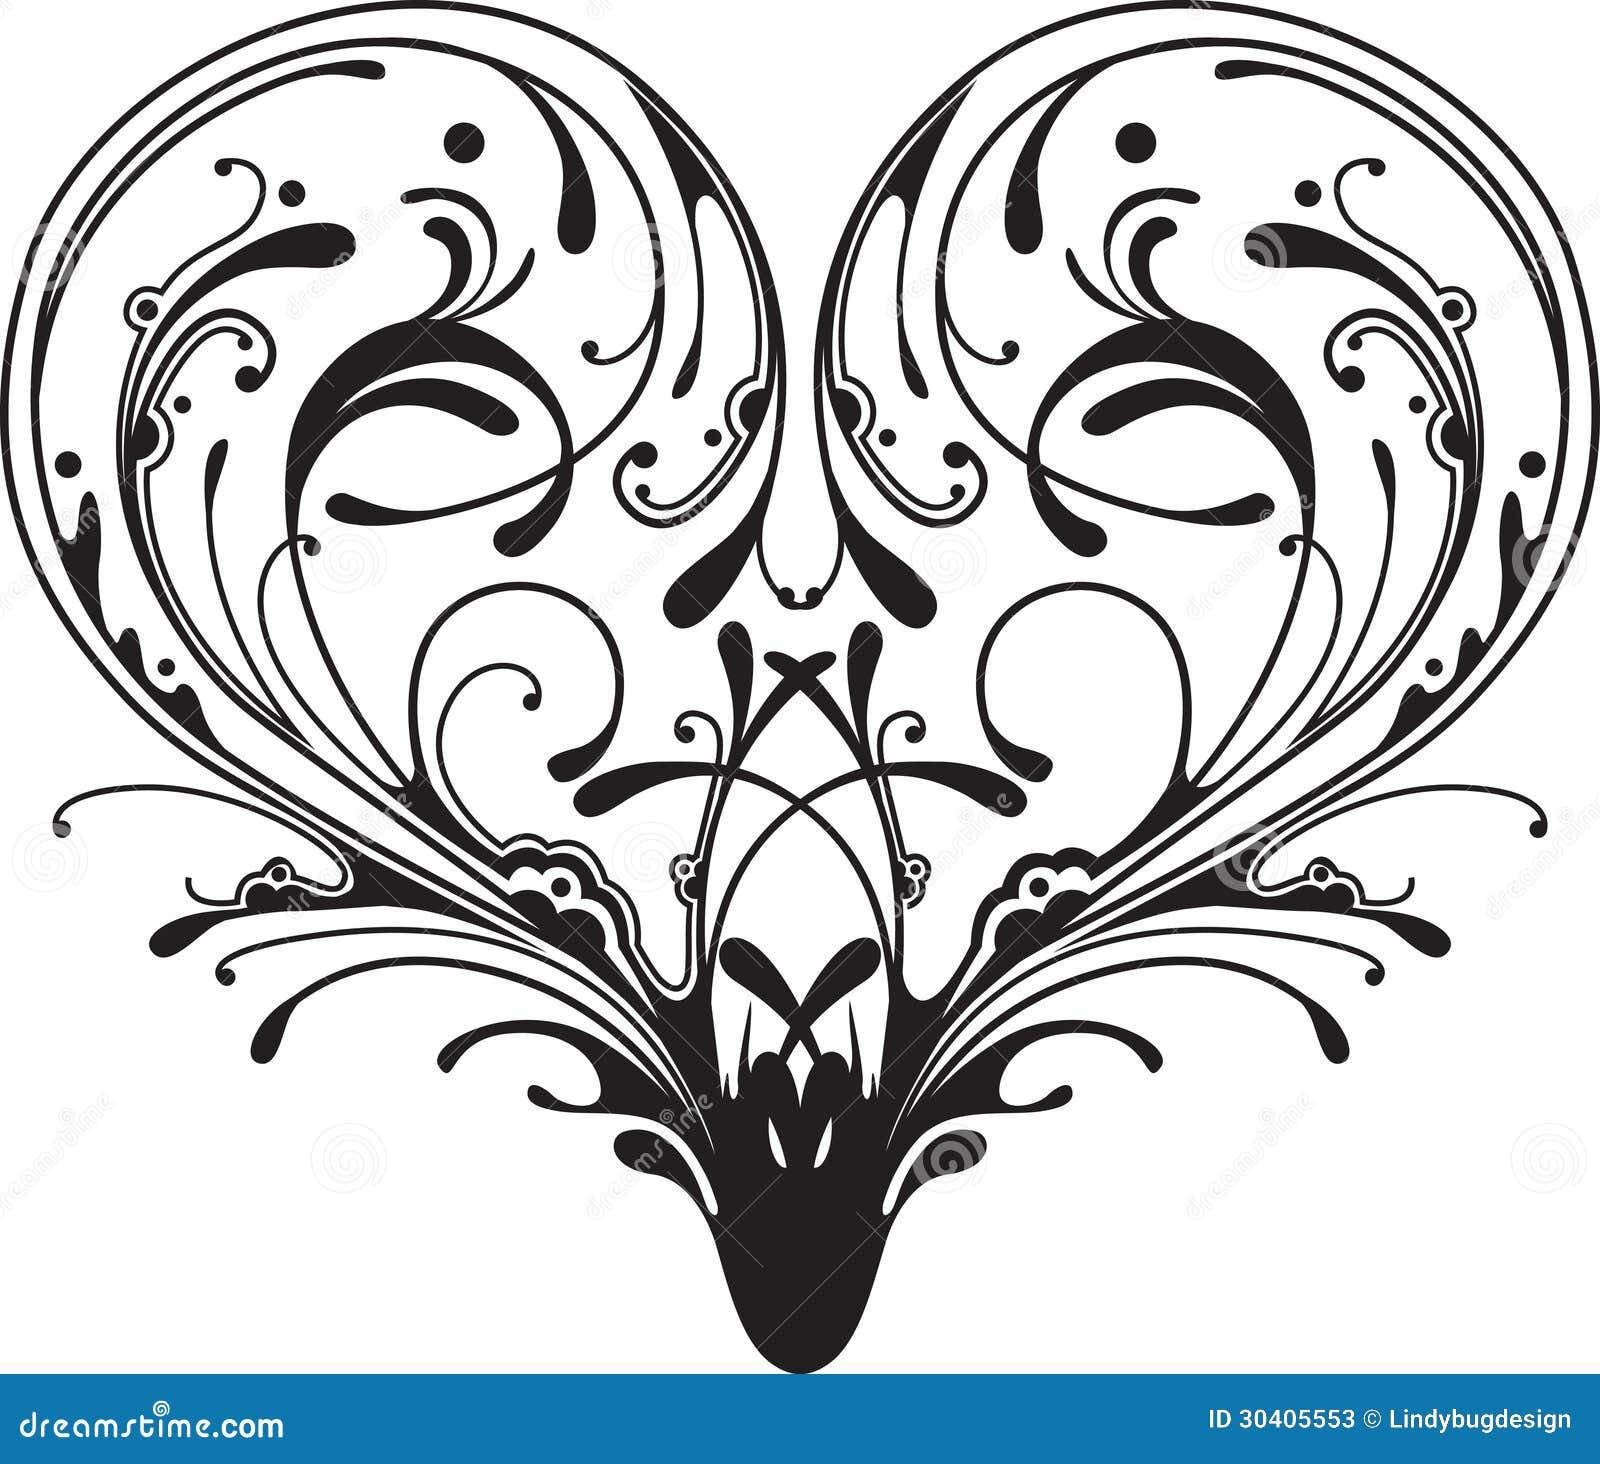 ornate heart stock vector image of fancy  emblem  elegant free filigree heart clip art free clip art in filigree and color teal